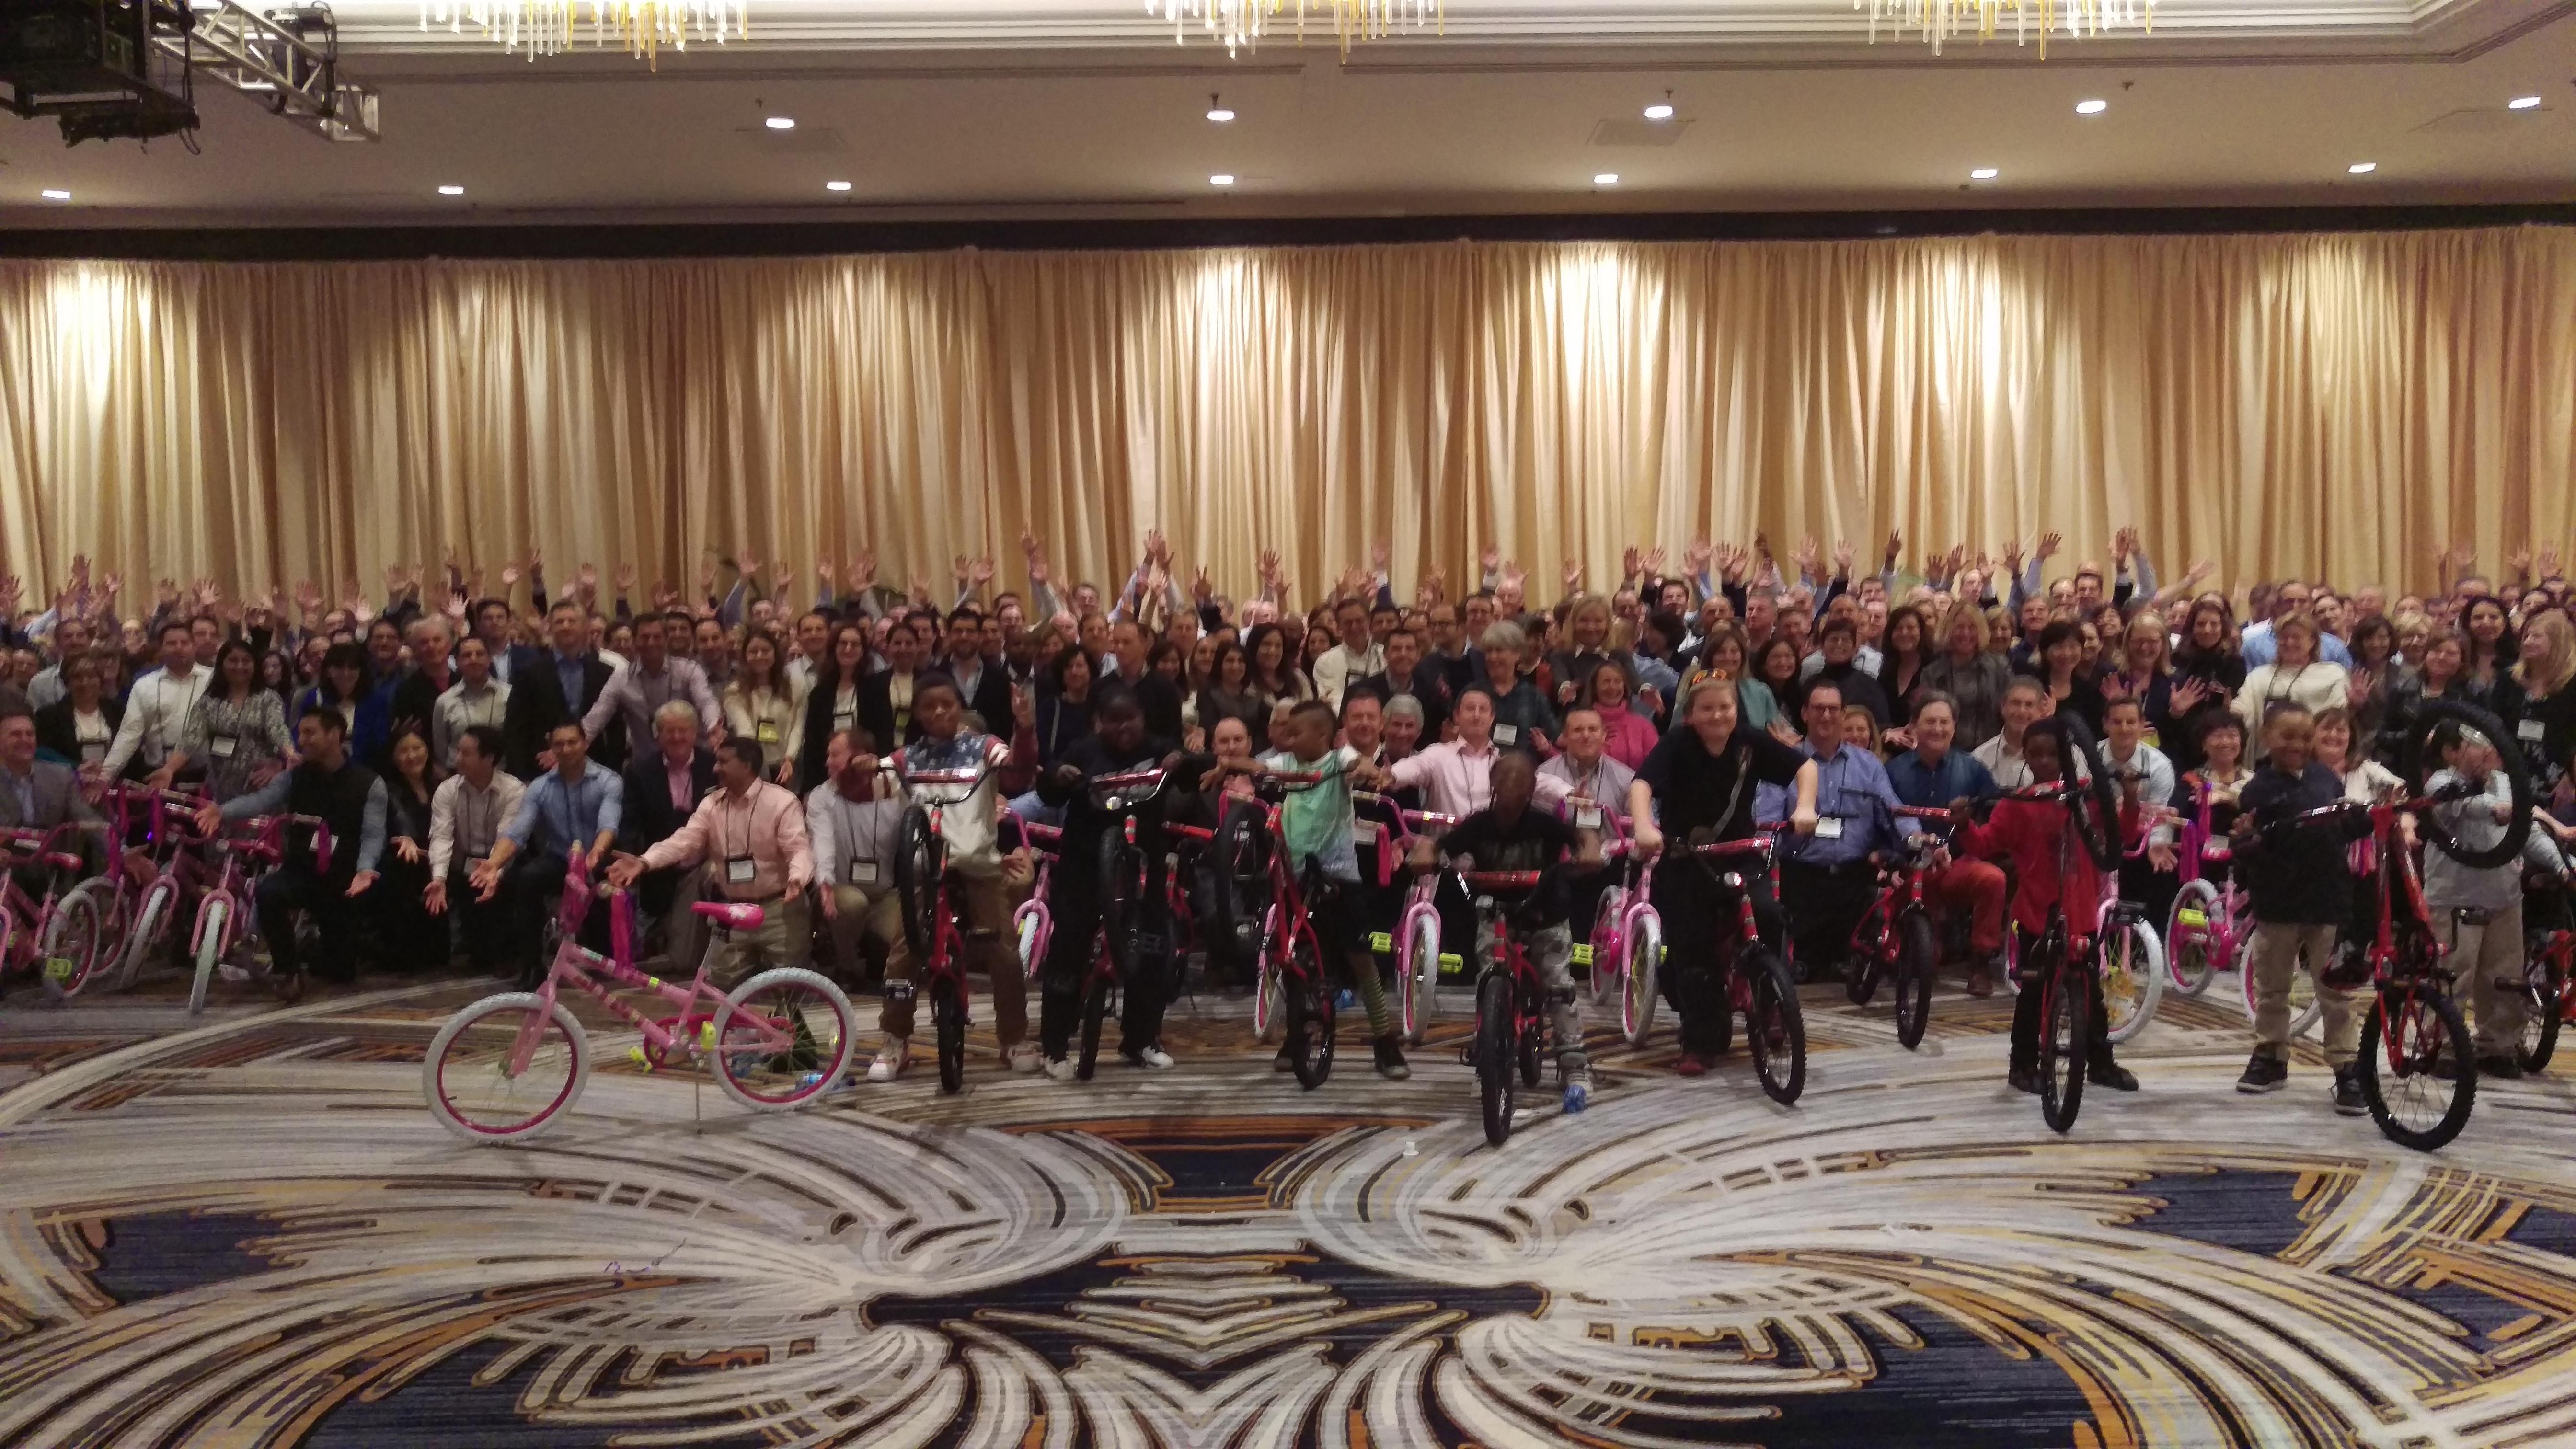 First Republic 400 Person Build-A-Bike Event in San Francisco, CA